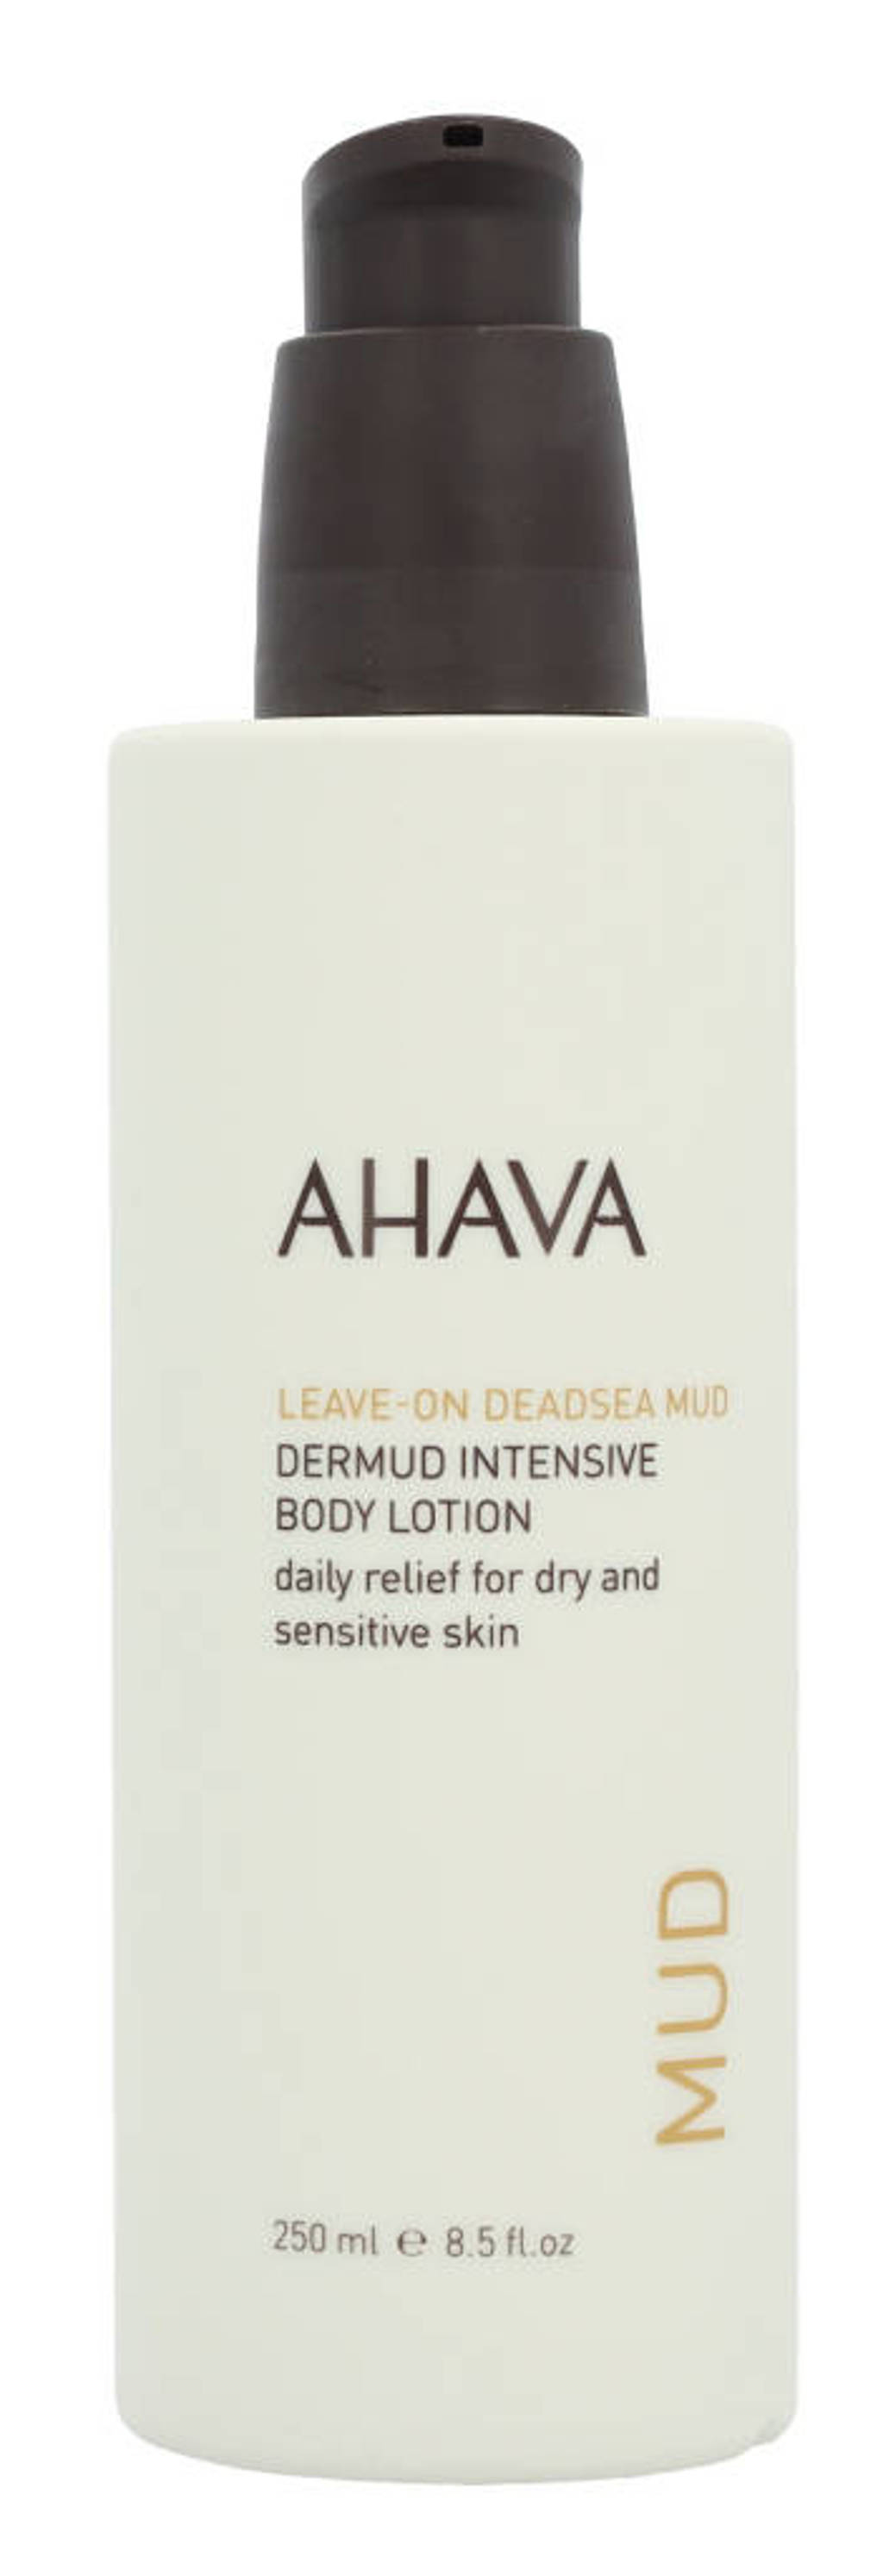 Ahava Deadsea Mud Dermud Intensive bodycrème